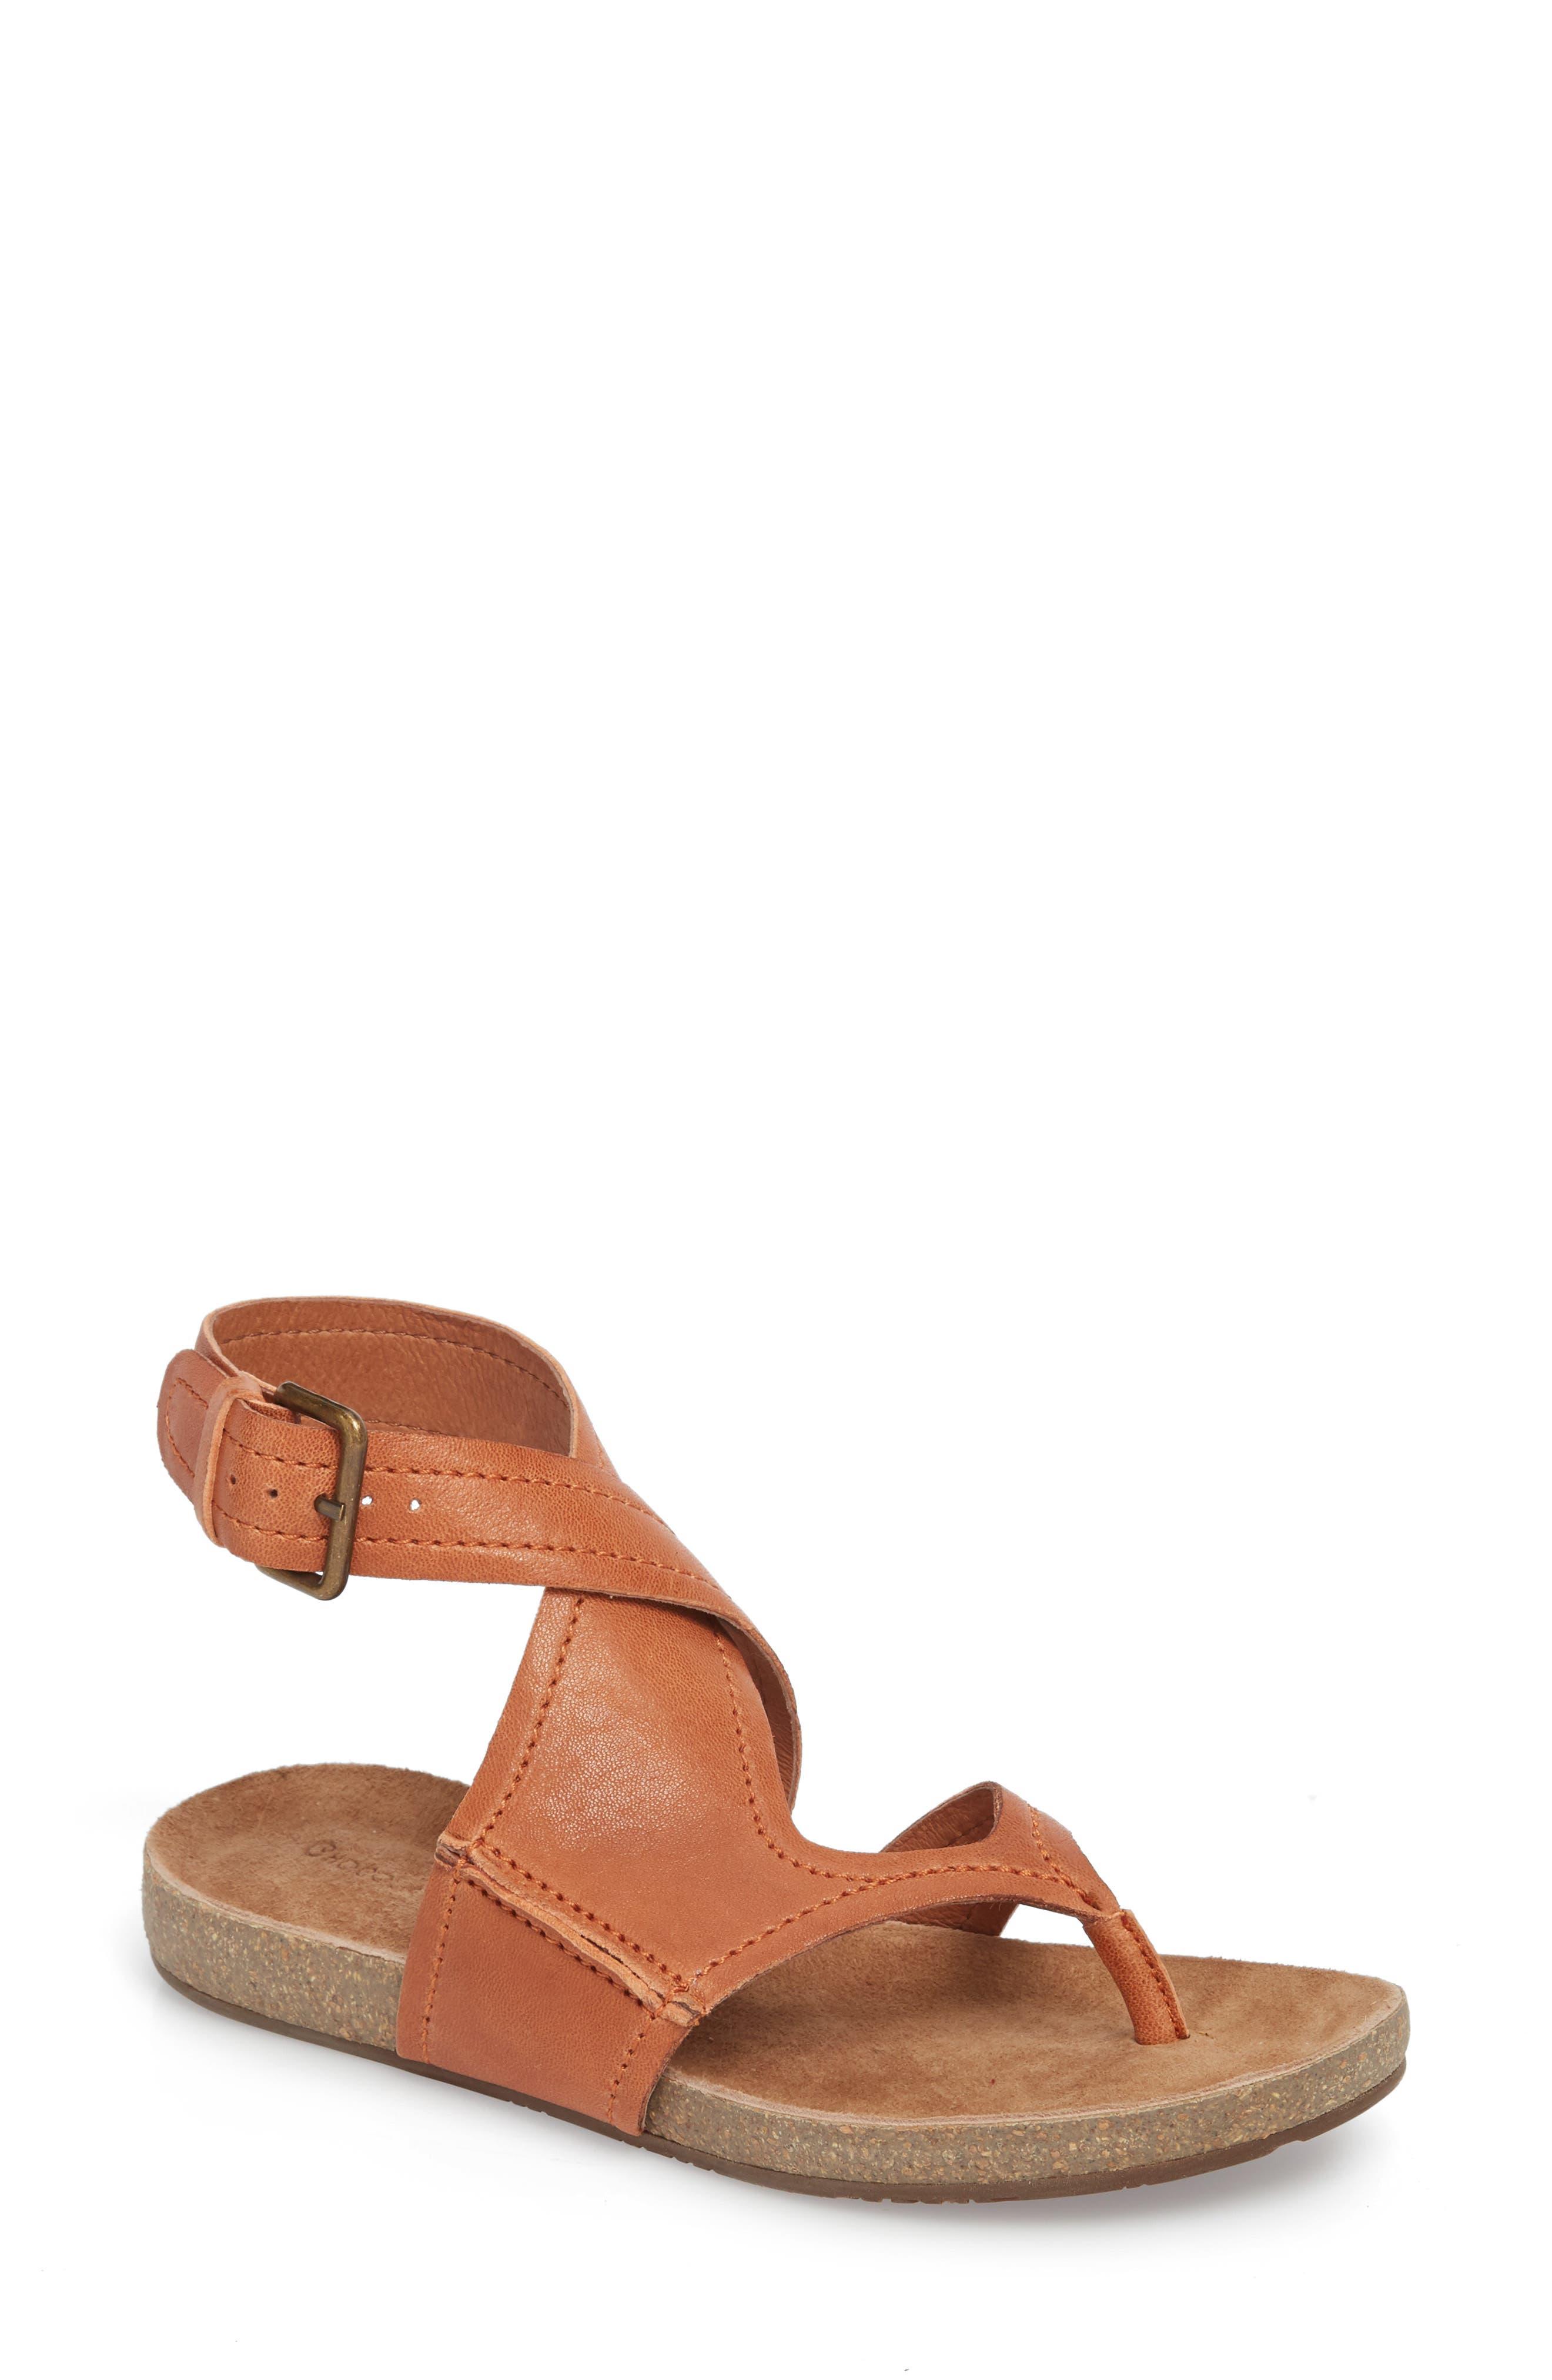 Main Image - Chocolat Blu Yagger Sandal (Women)